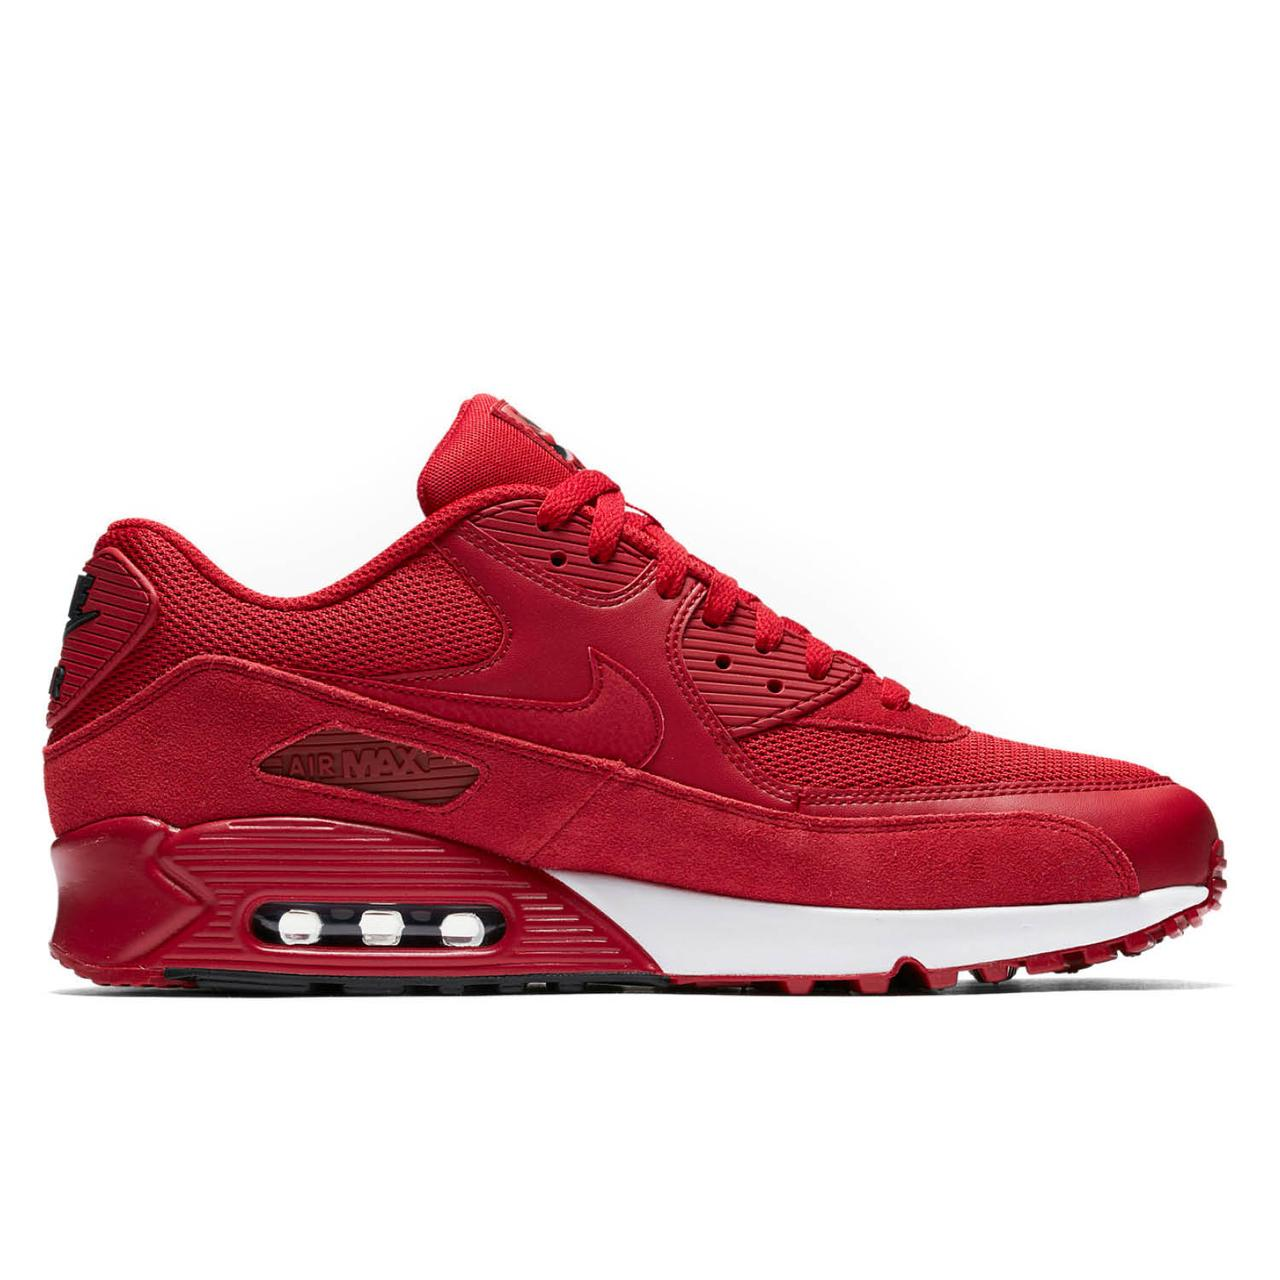 e5ce4e7c Оригинальные кроссовки Nike Air Max 90 Essential Gym Red , цена 3 460 грн.,  купить в Ивано-Франковске — Prom.ua (ID#621893475)